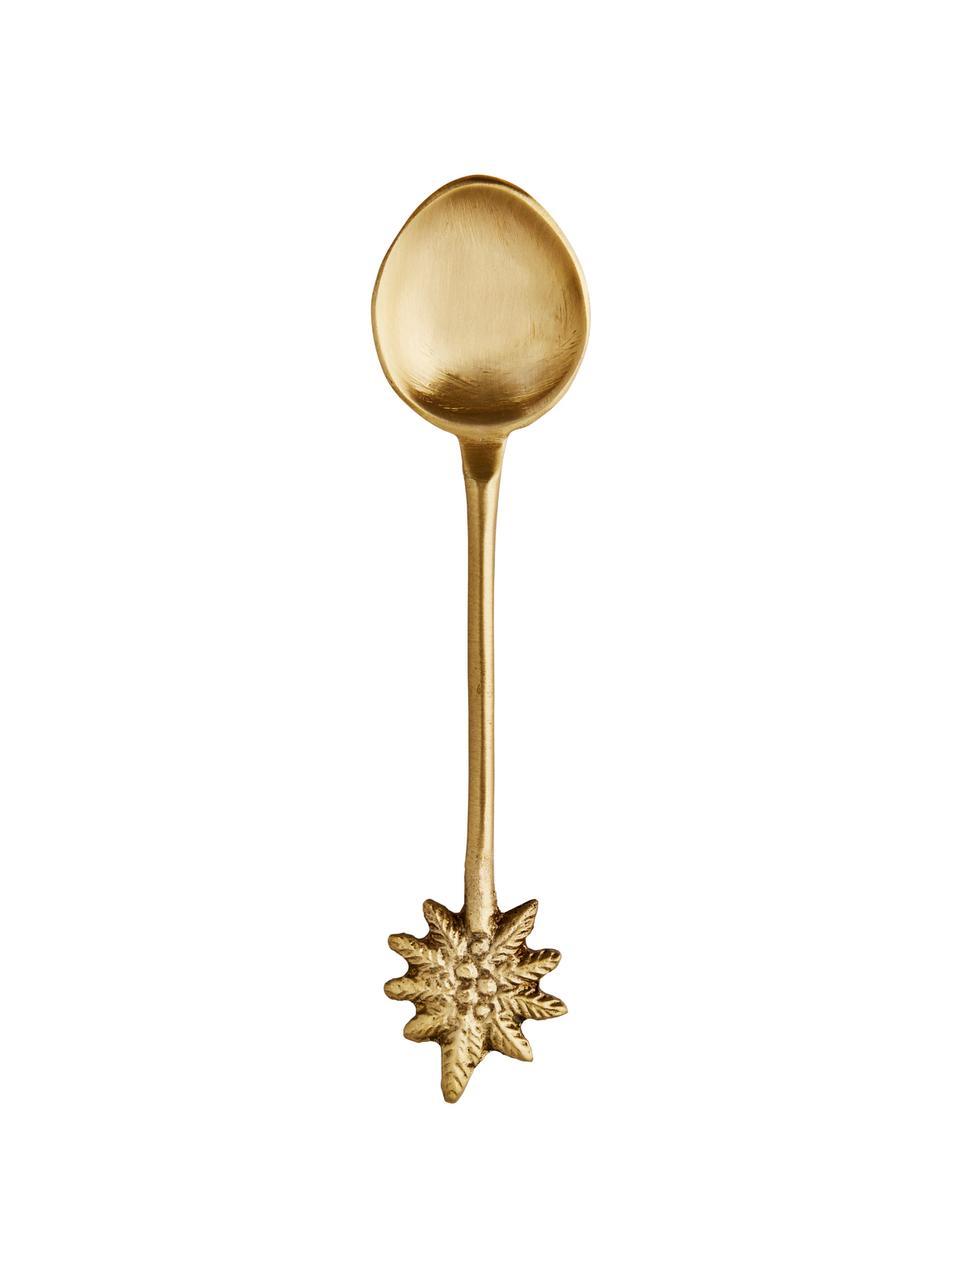 Goldfarbener Zuckerlöffel Mali aus Messing, Messing, Messing, L 11 cm